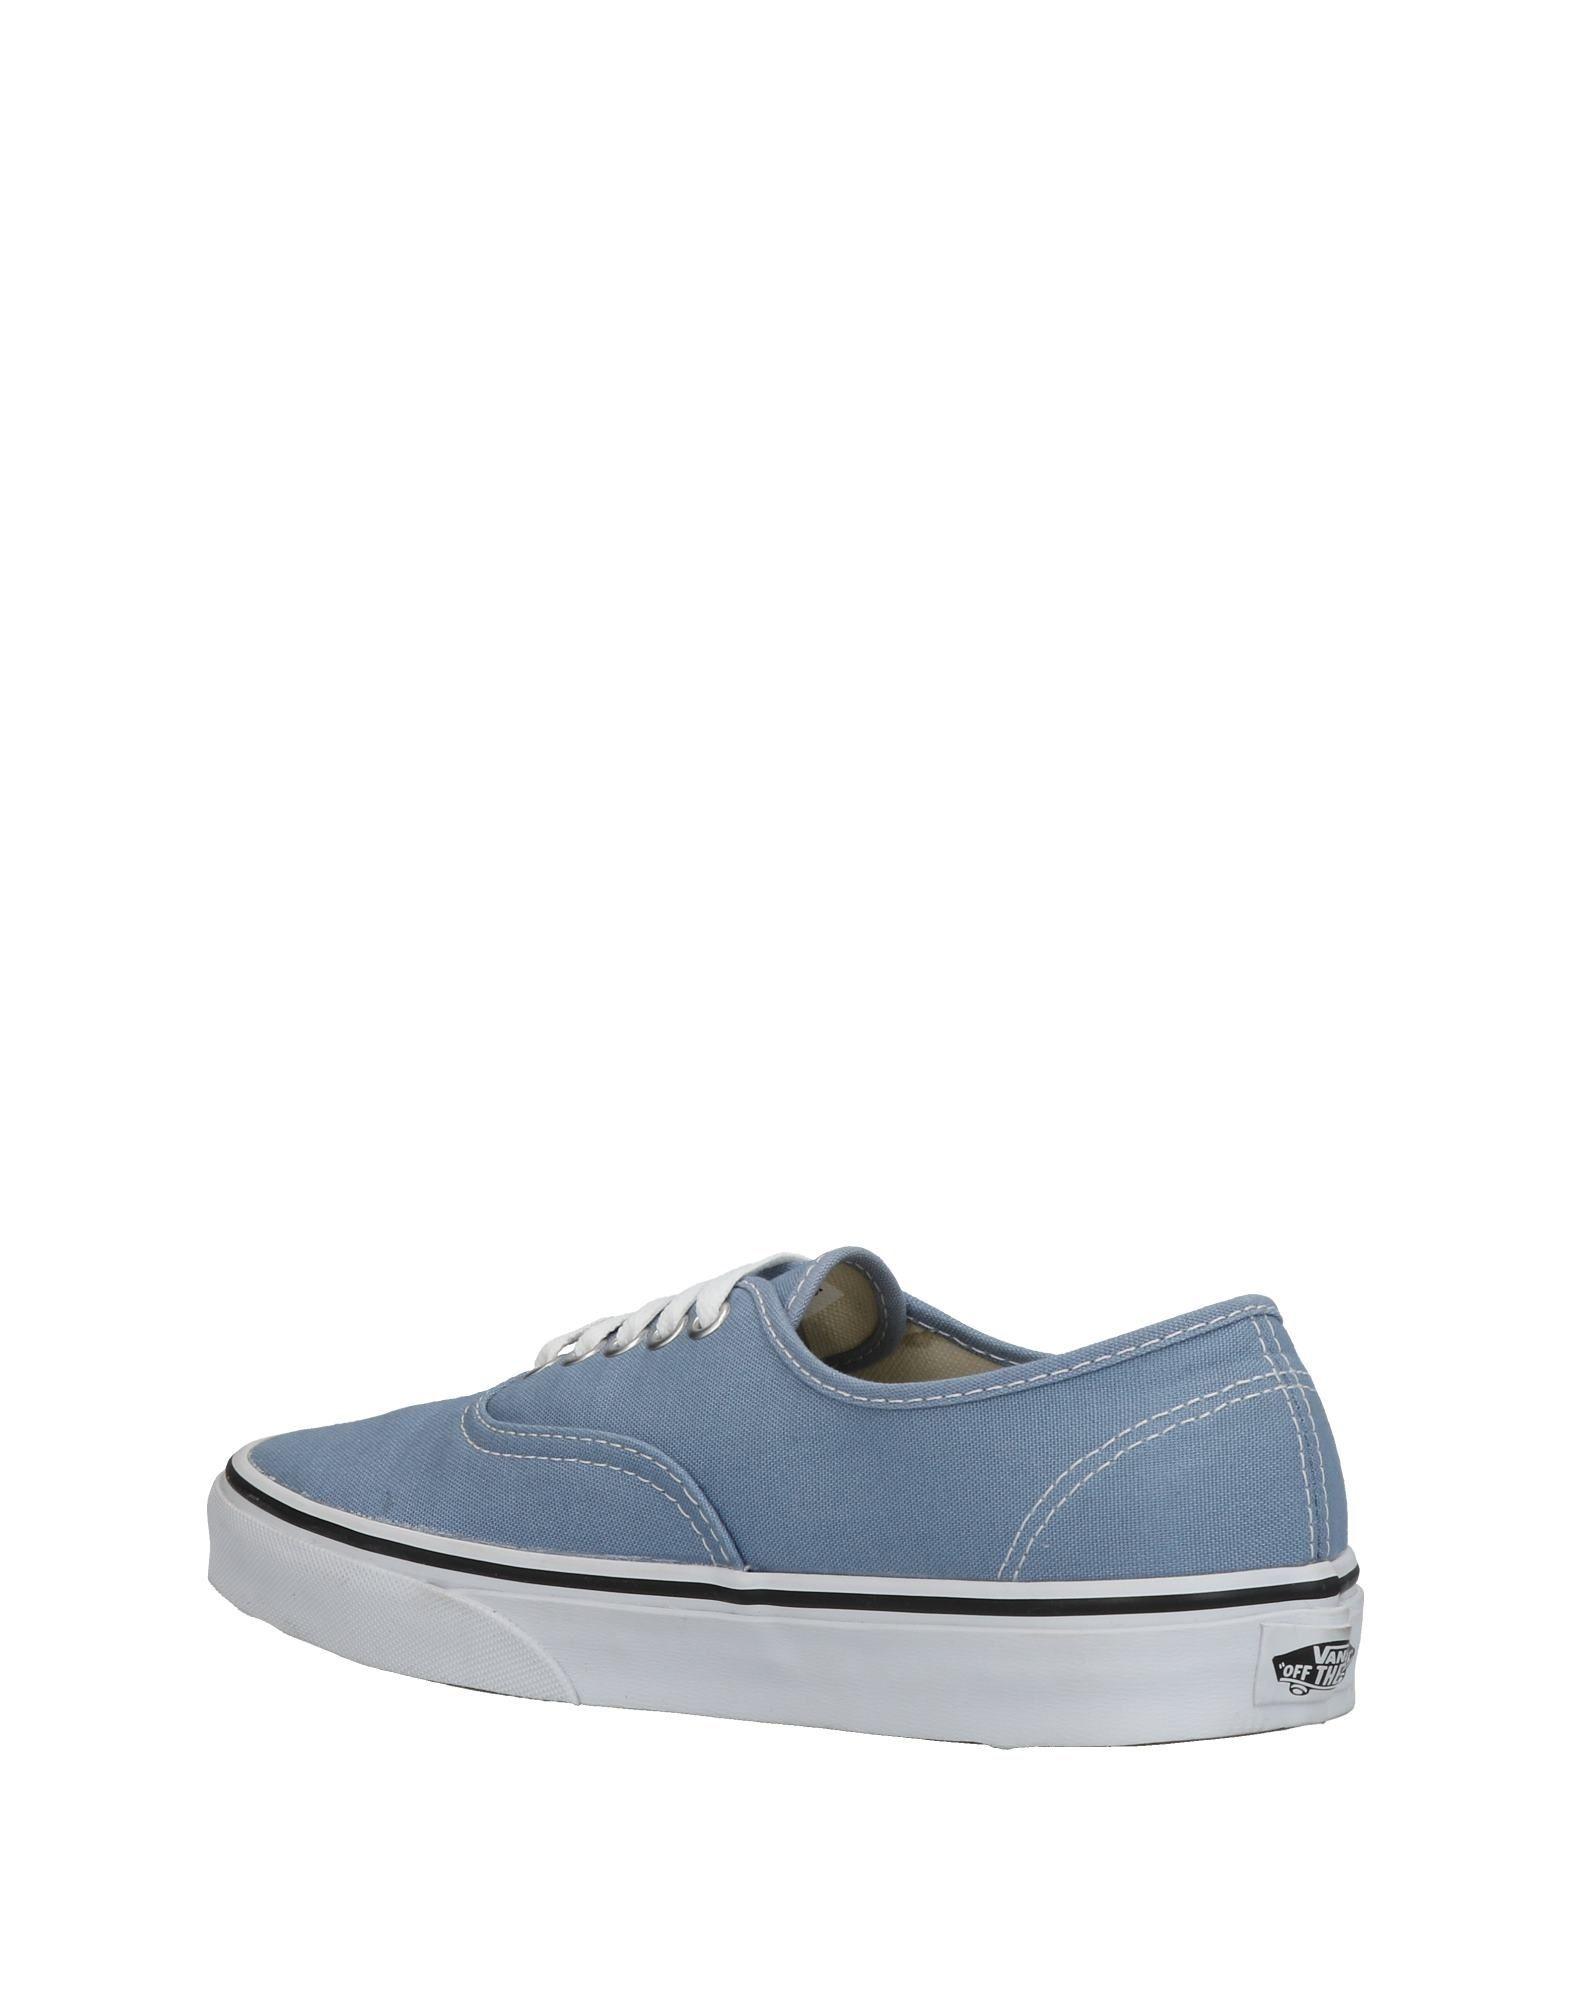 FOOTWEAR Vans Sky blue Woman Textile fibres